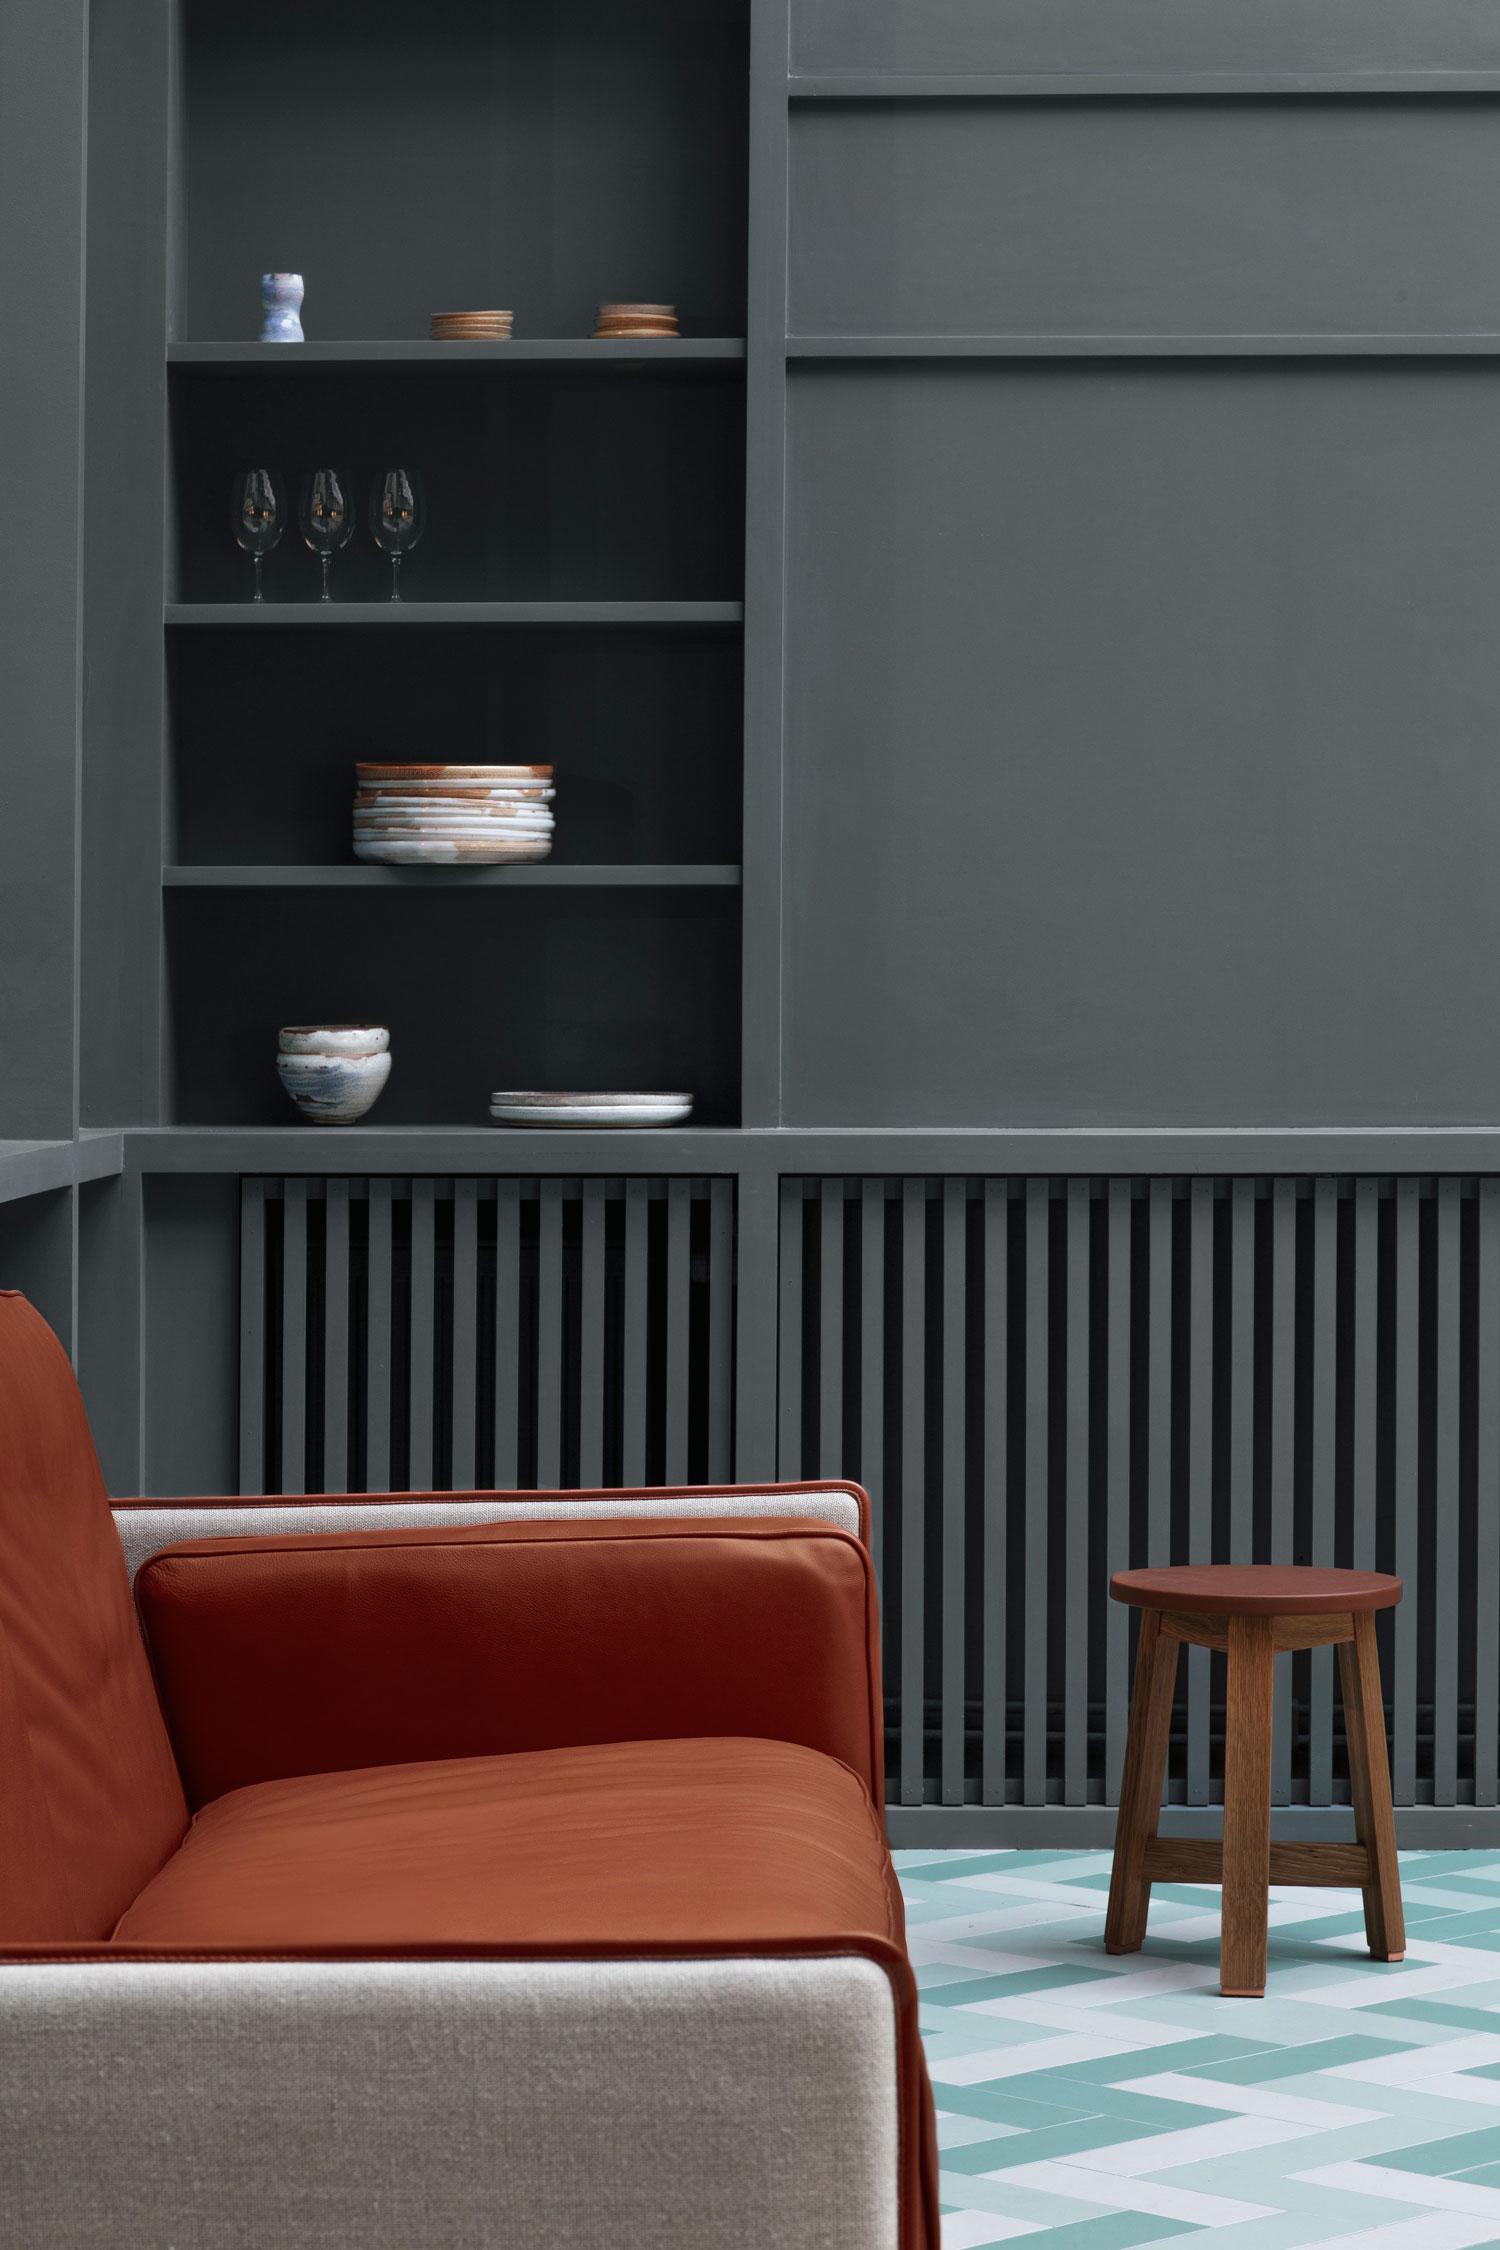 StudioGabrielle_TrendReport_Terracotta_Tones